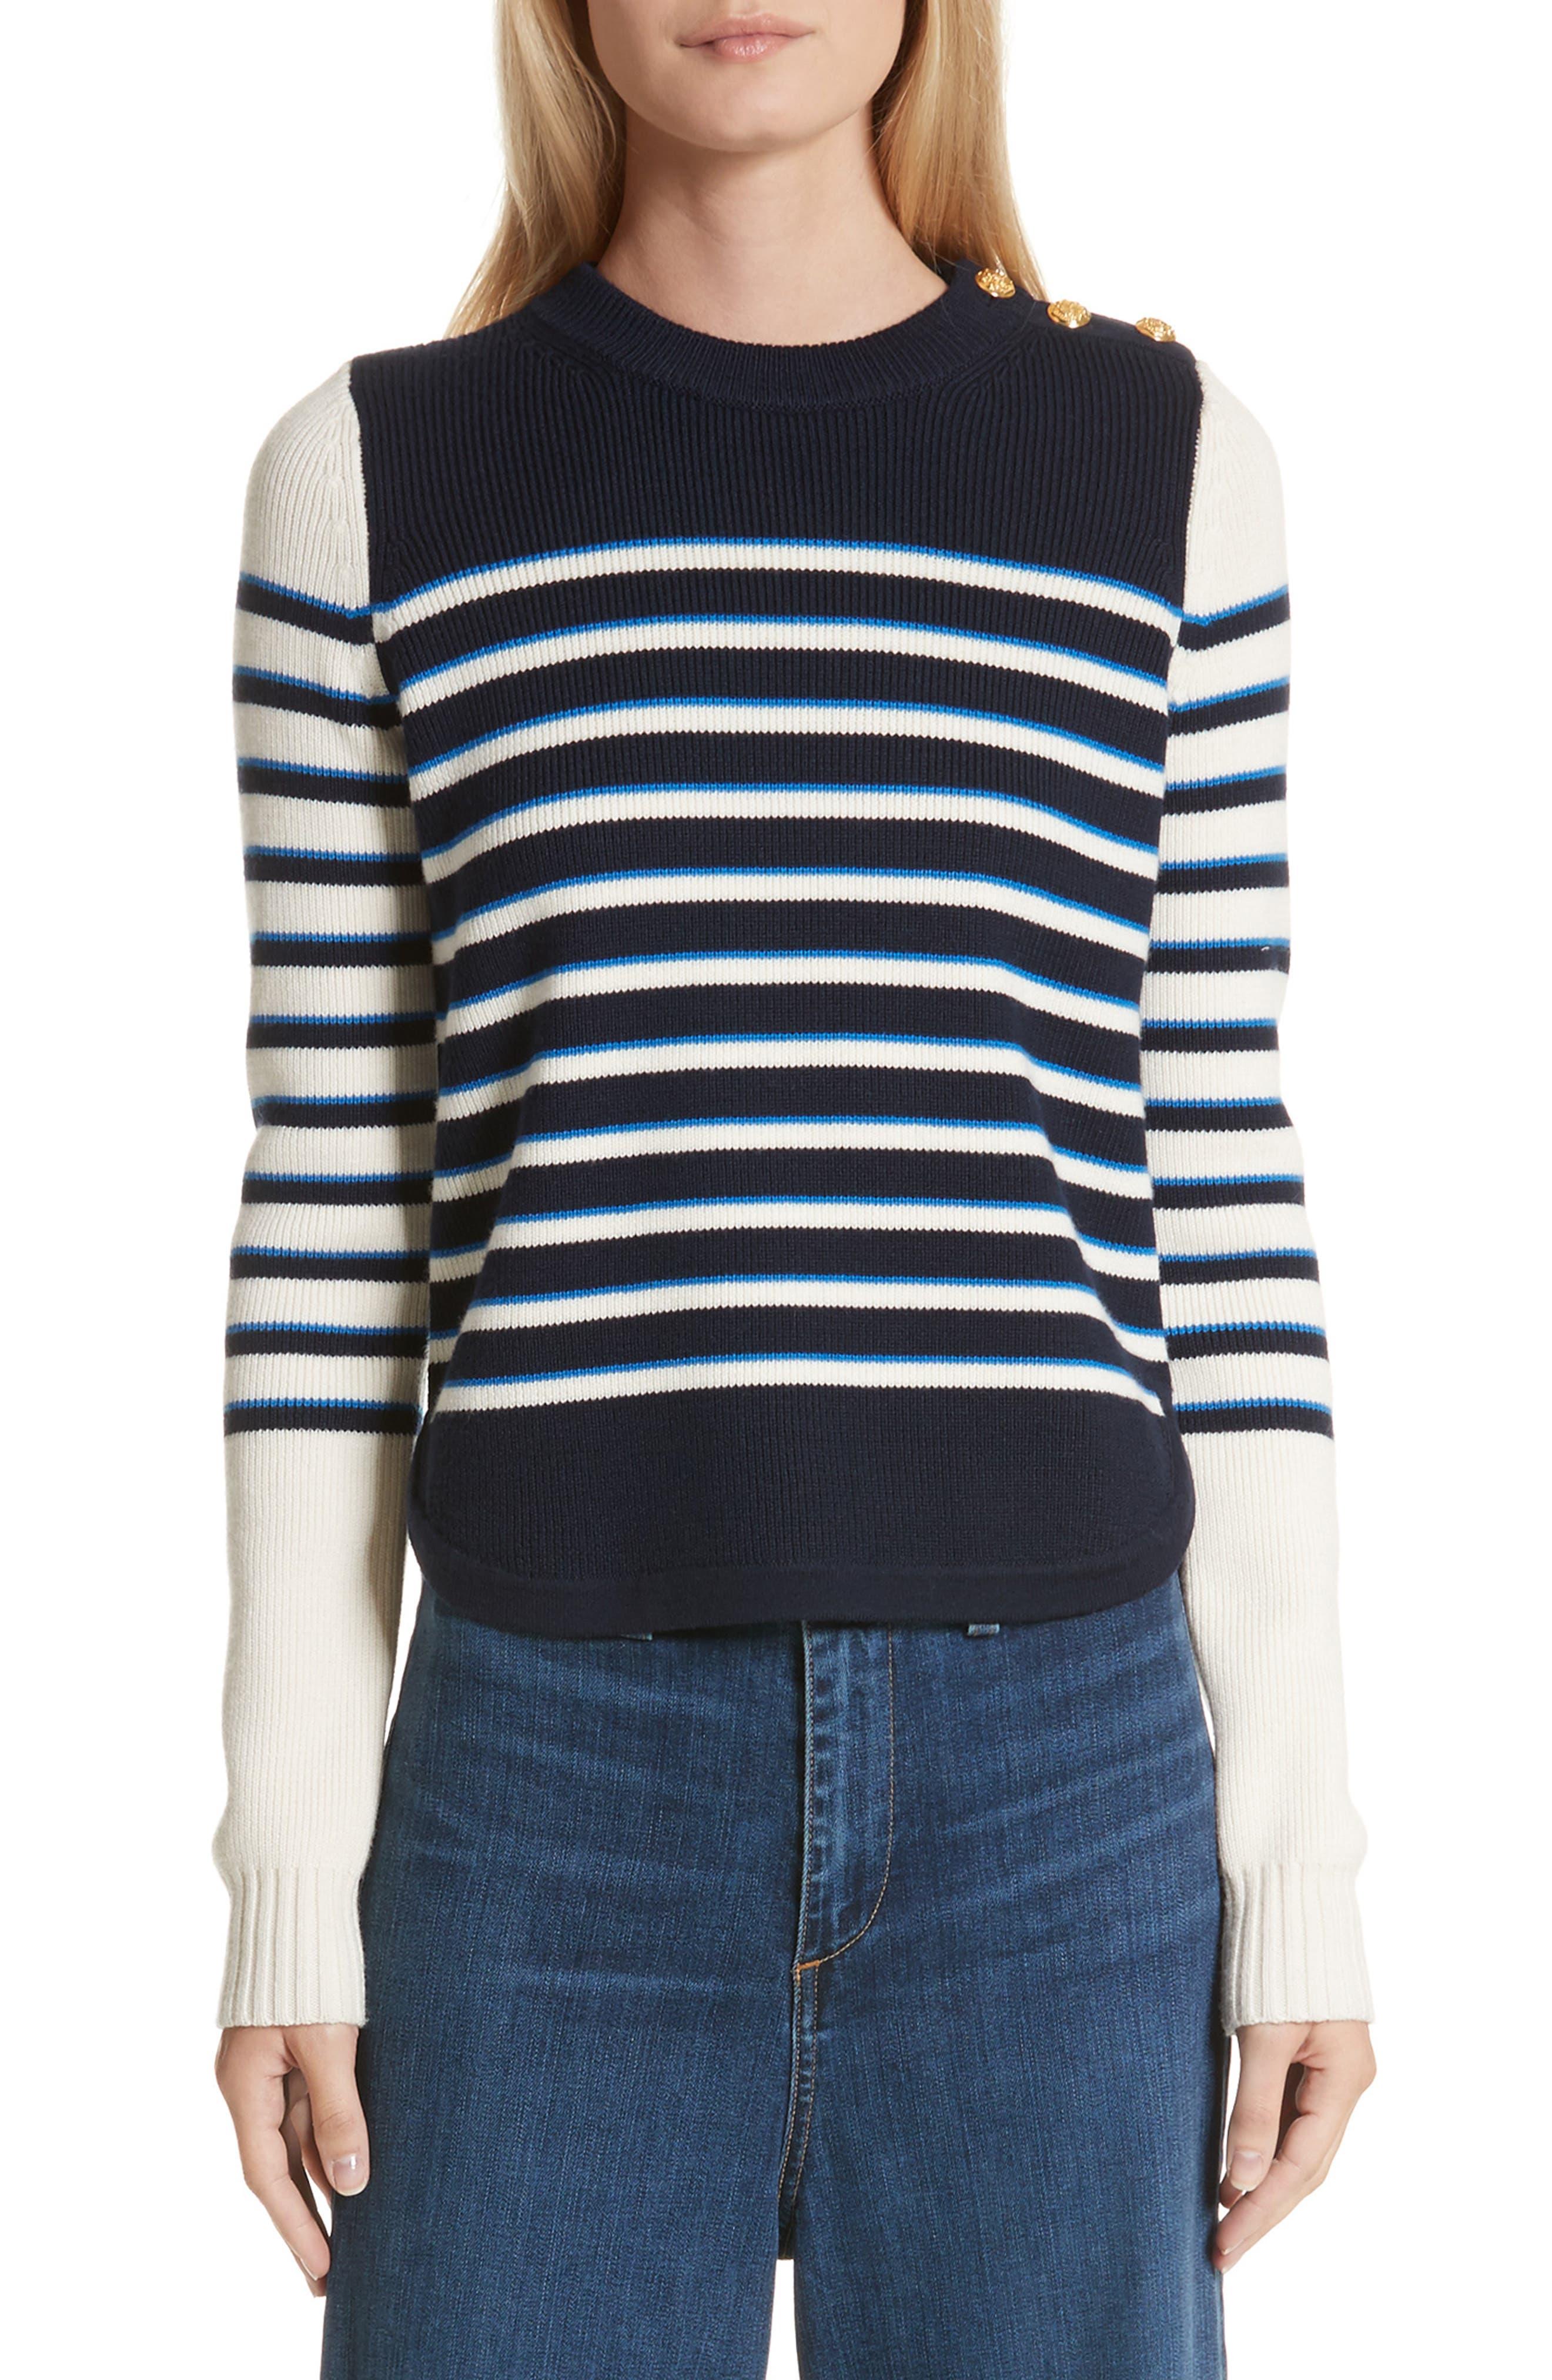 Amos Stripe Merino Wool Sweater,                             Main thumbnail 1, color,                             Navy/ Ivory/ Blue